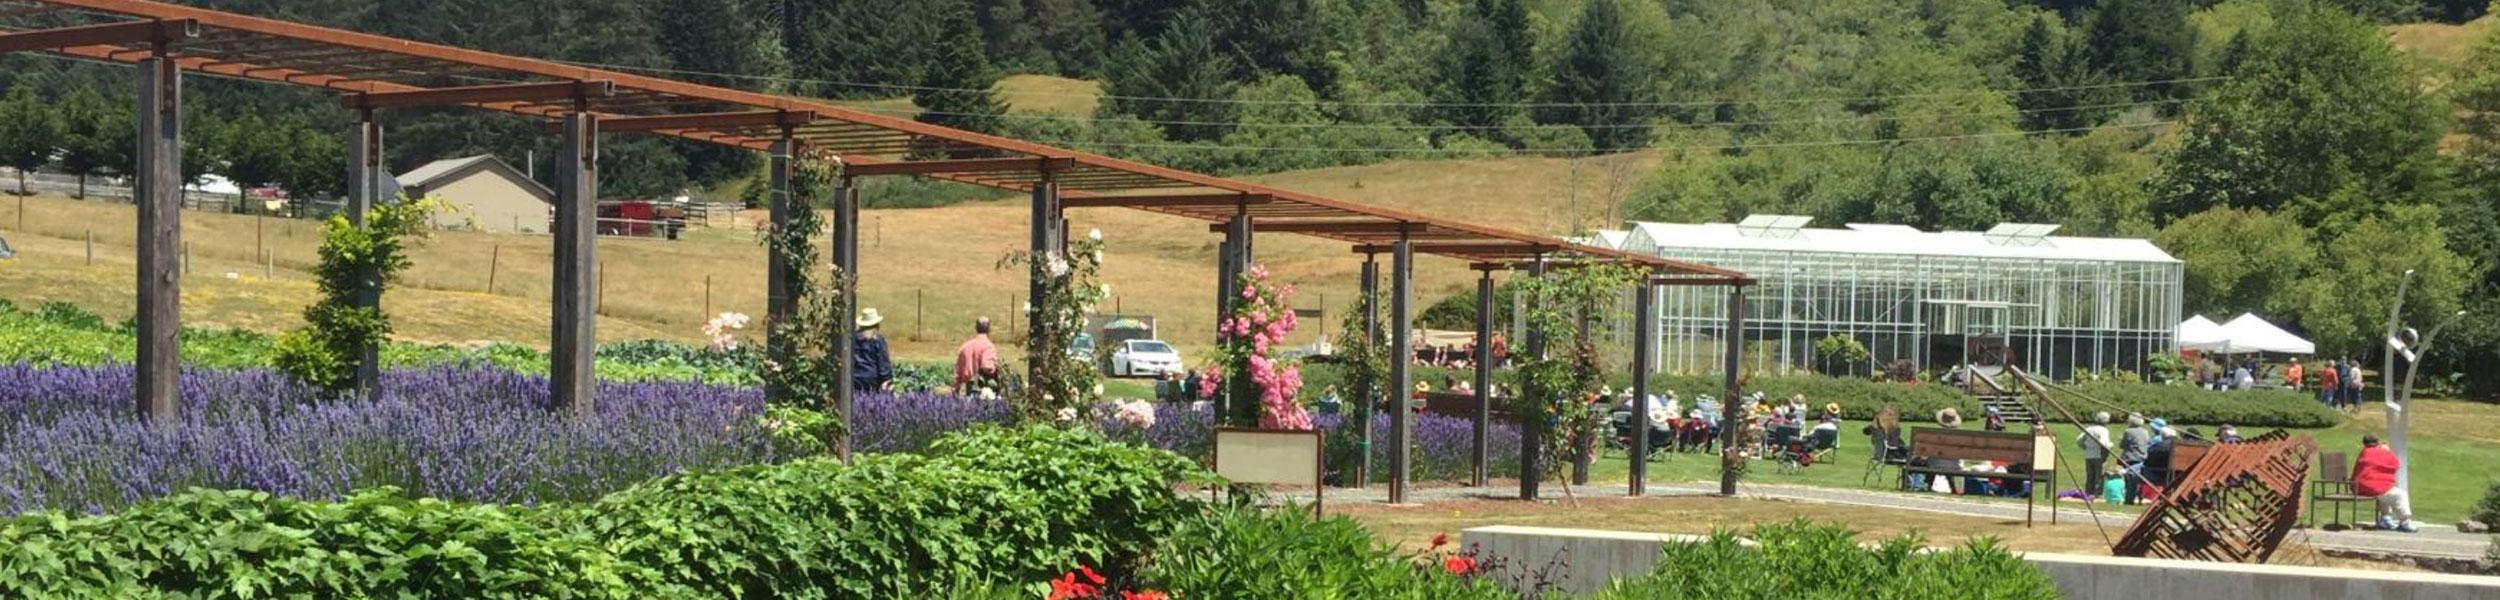 Humboldt Botanical Garden Summer Music Series- North Coast Brass Ensemble